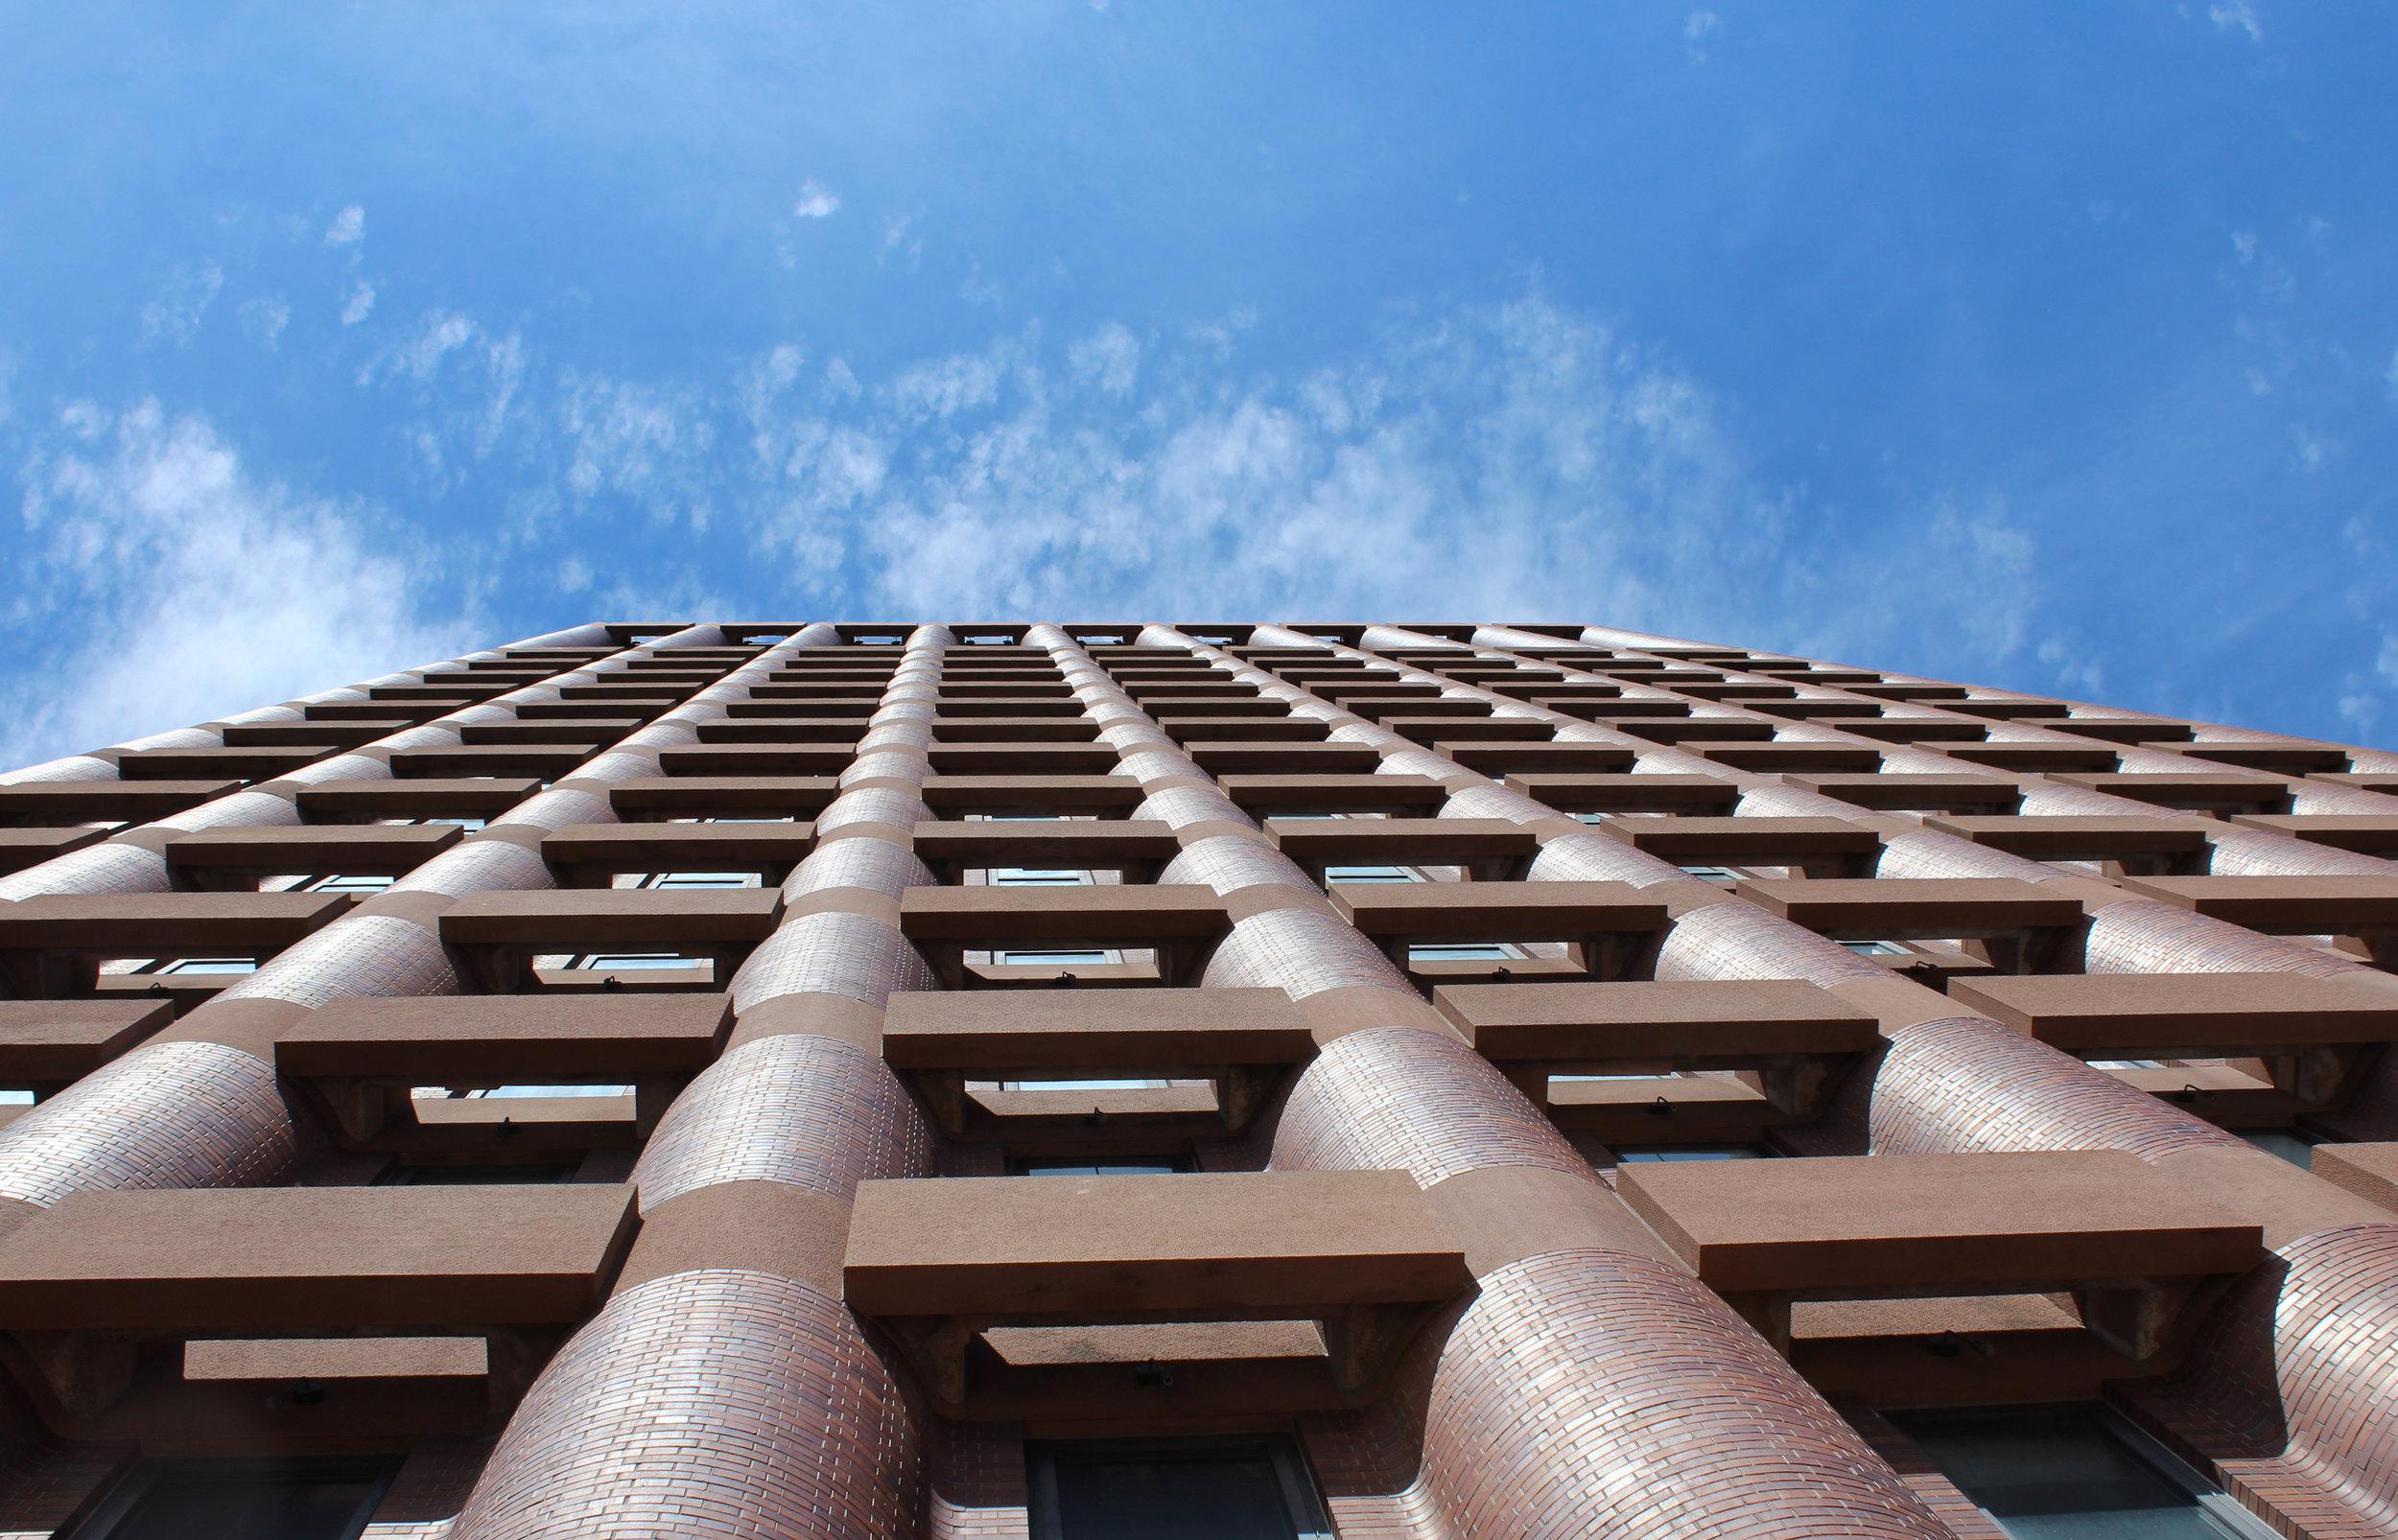 Kline Biology Tower, 219 Prospect Street. Architect: Philip Johnson Associates, 1964.